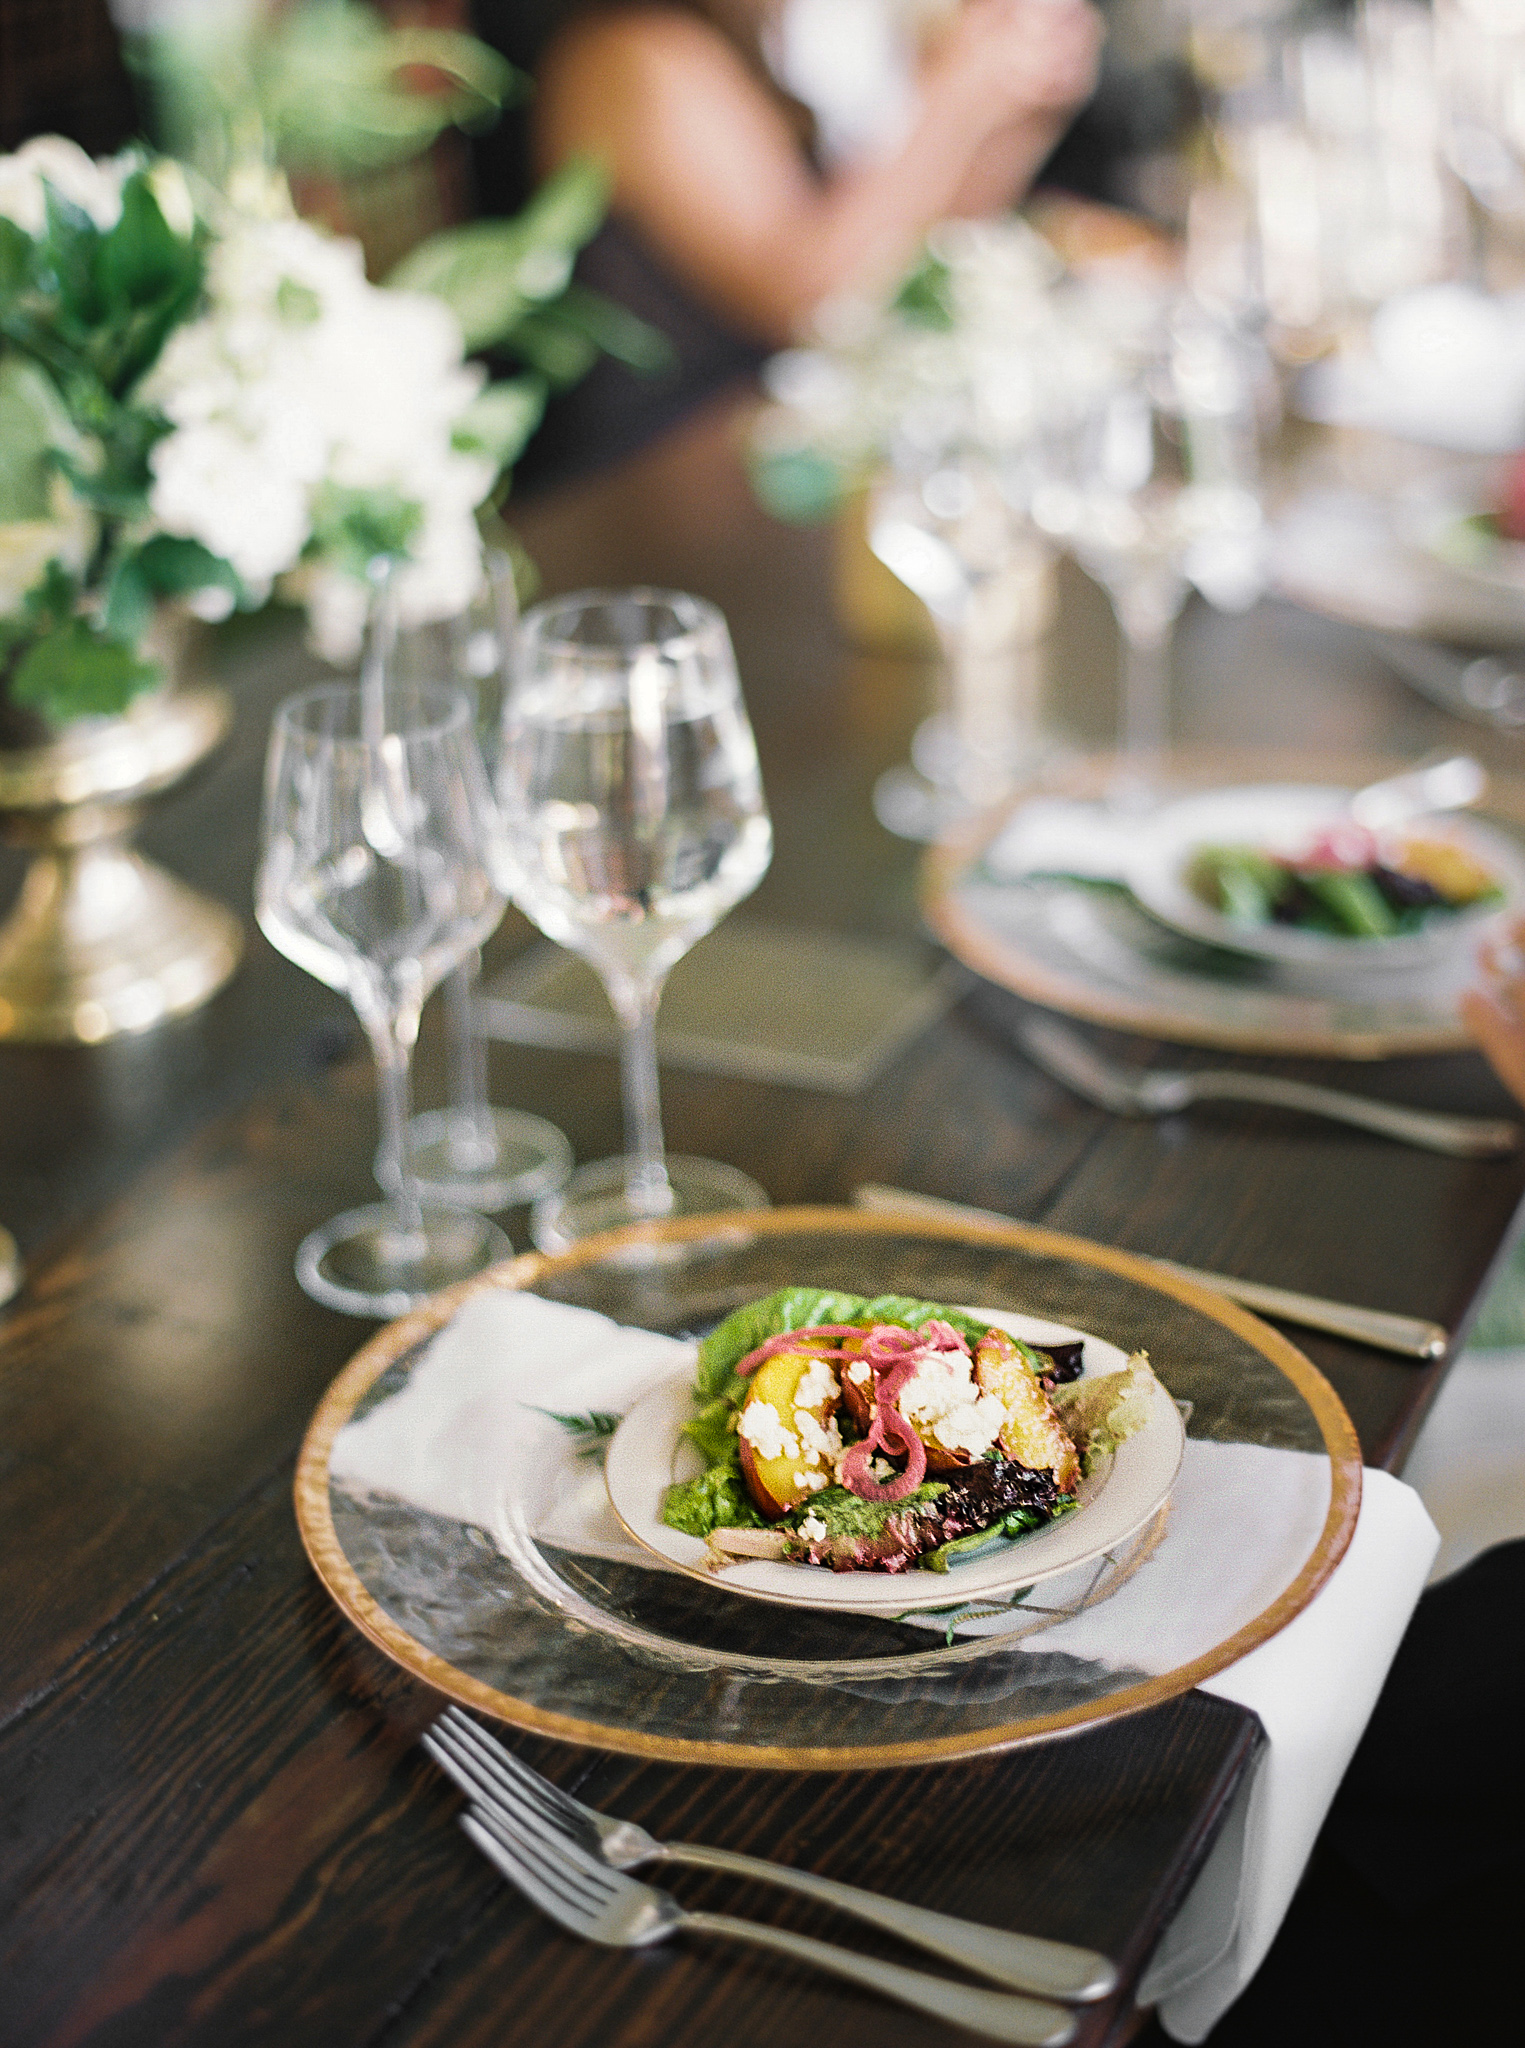 173OutliveCreative_Travel_Photographer_Videographer_Lewis&Clark_Oregon_Elegant_BlackTie_Destination_Wedding.jpg